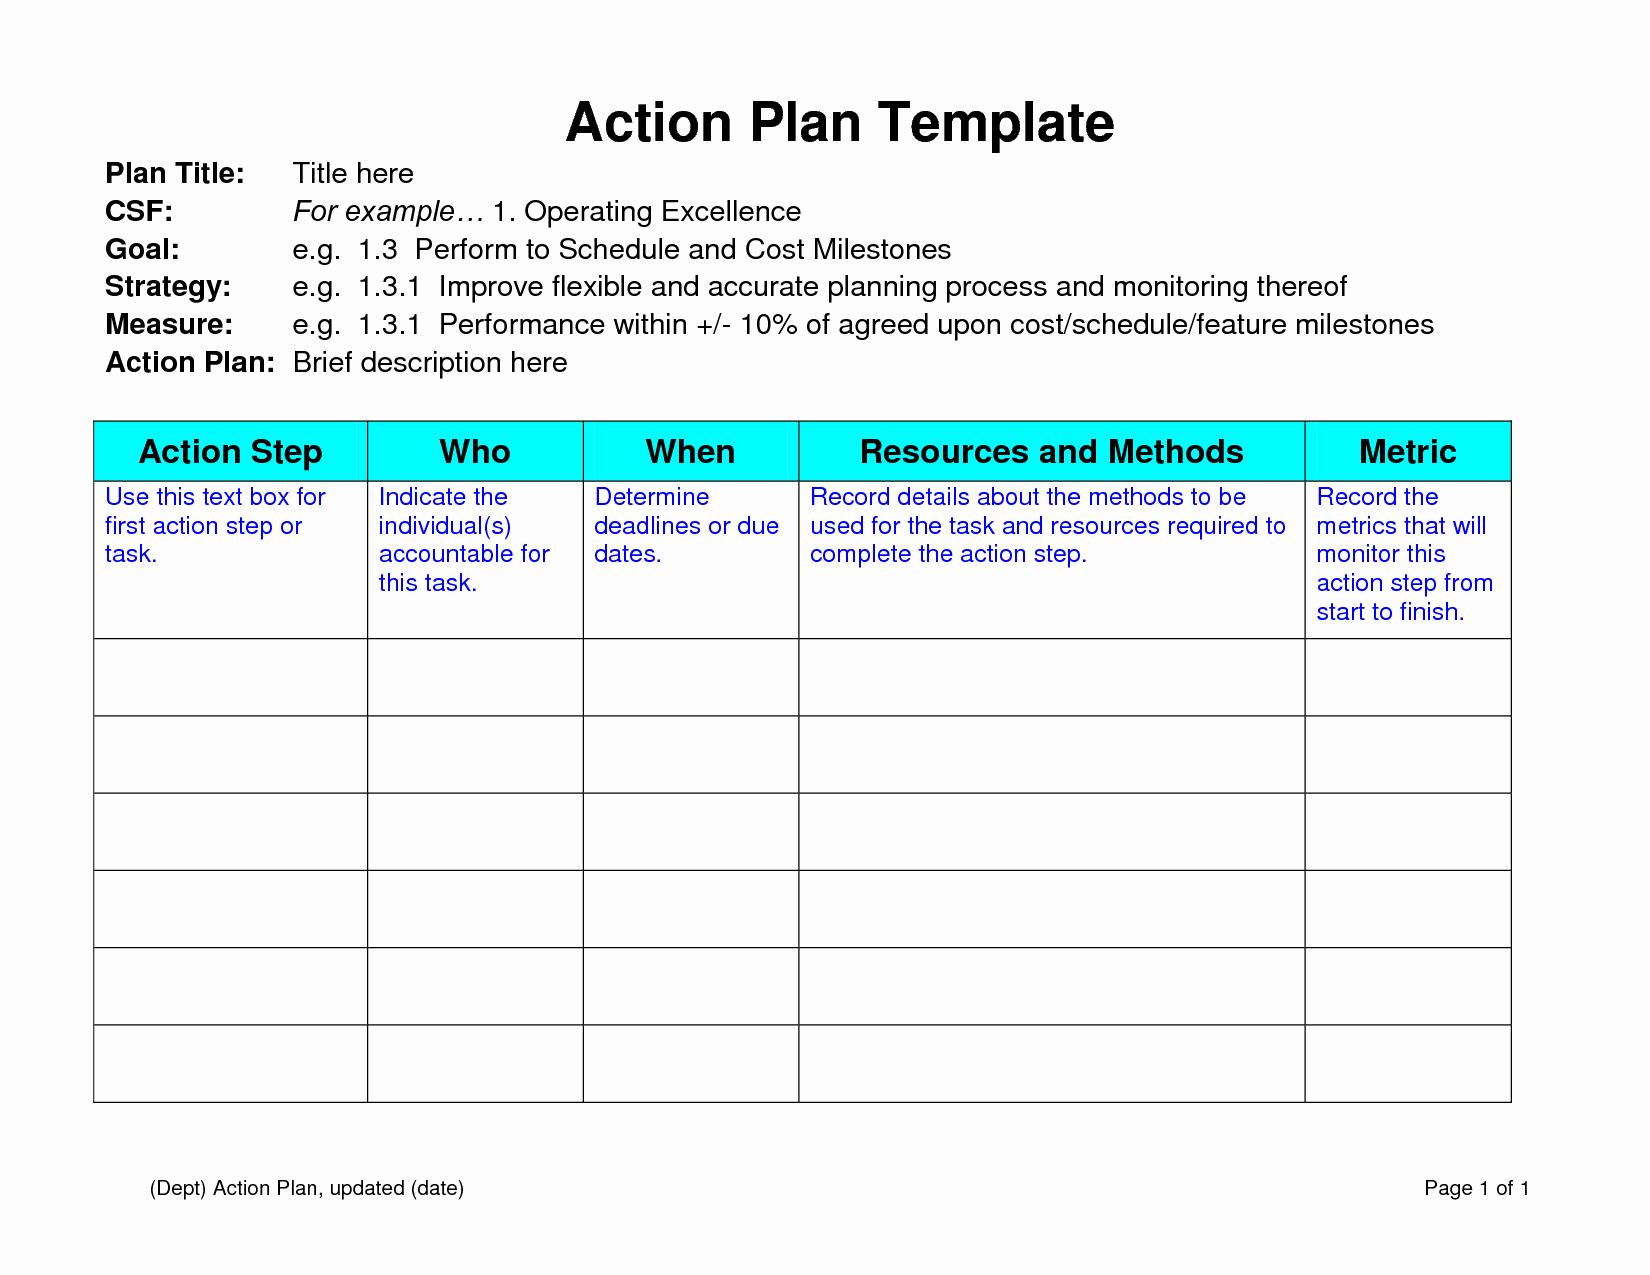 Action Plan Template Pdf Beautiful Sales Action Plan Template Pdf